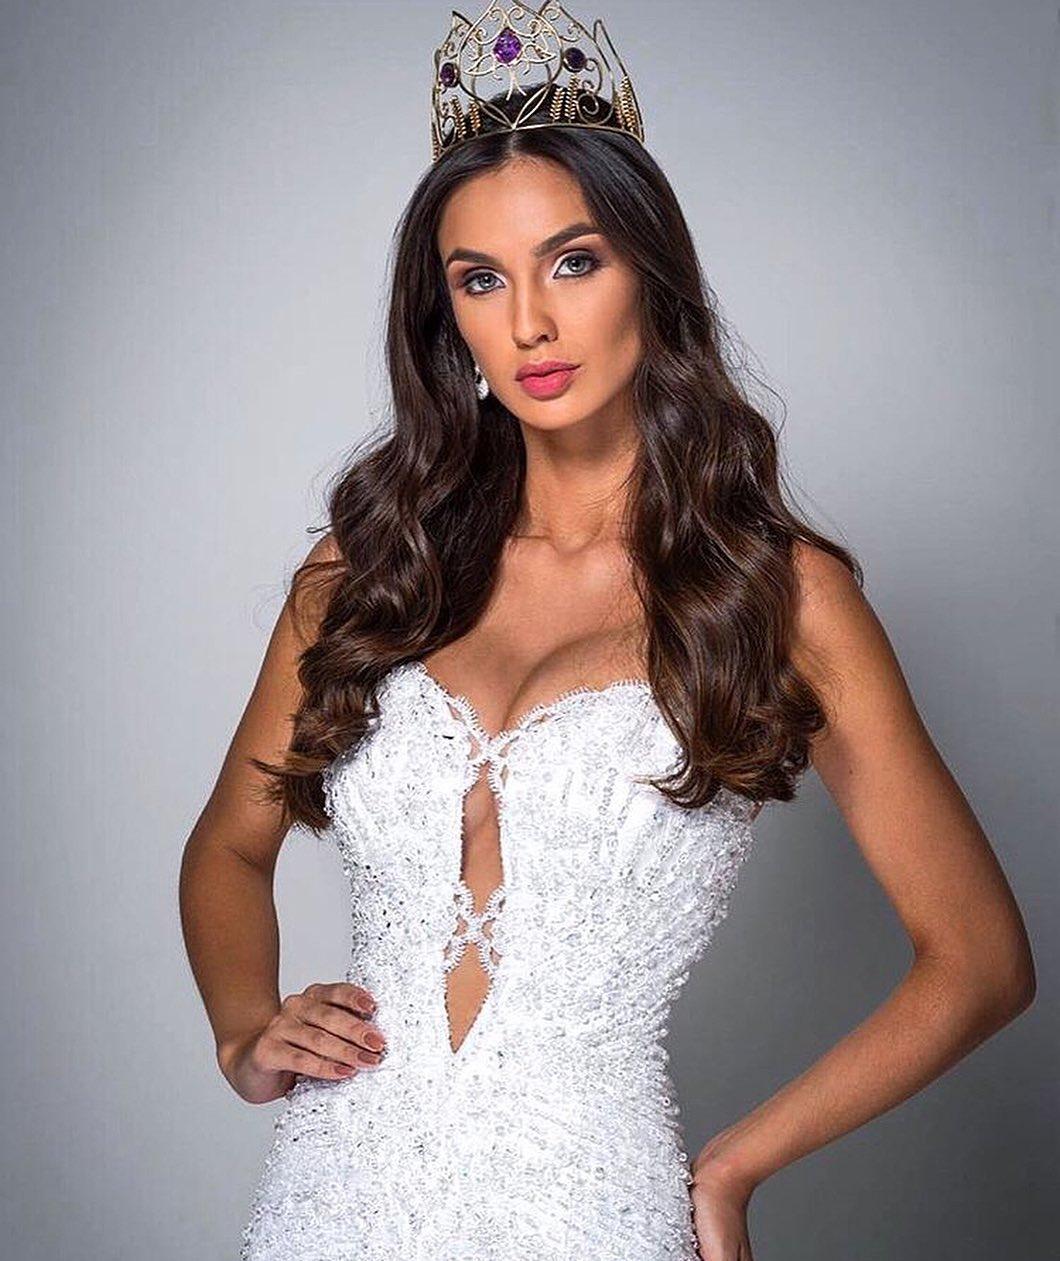 bianca scheren, top 5 de miss brasil universo 2019. - Página 11 82075311